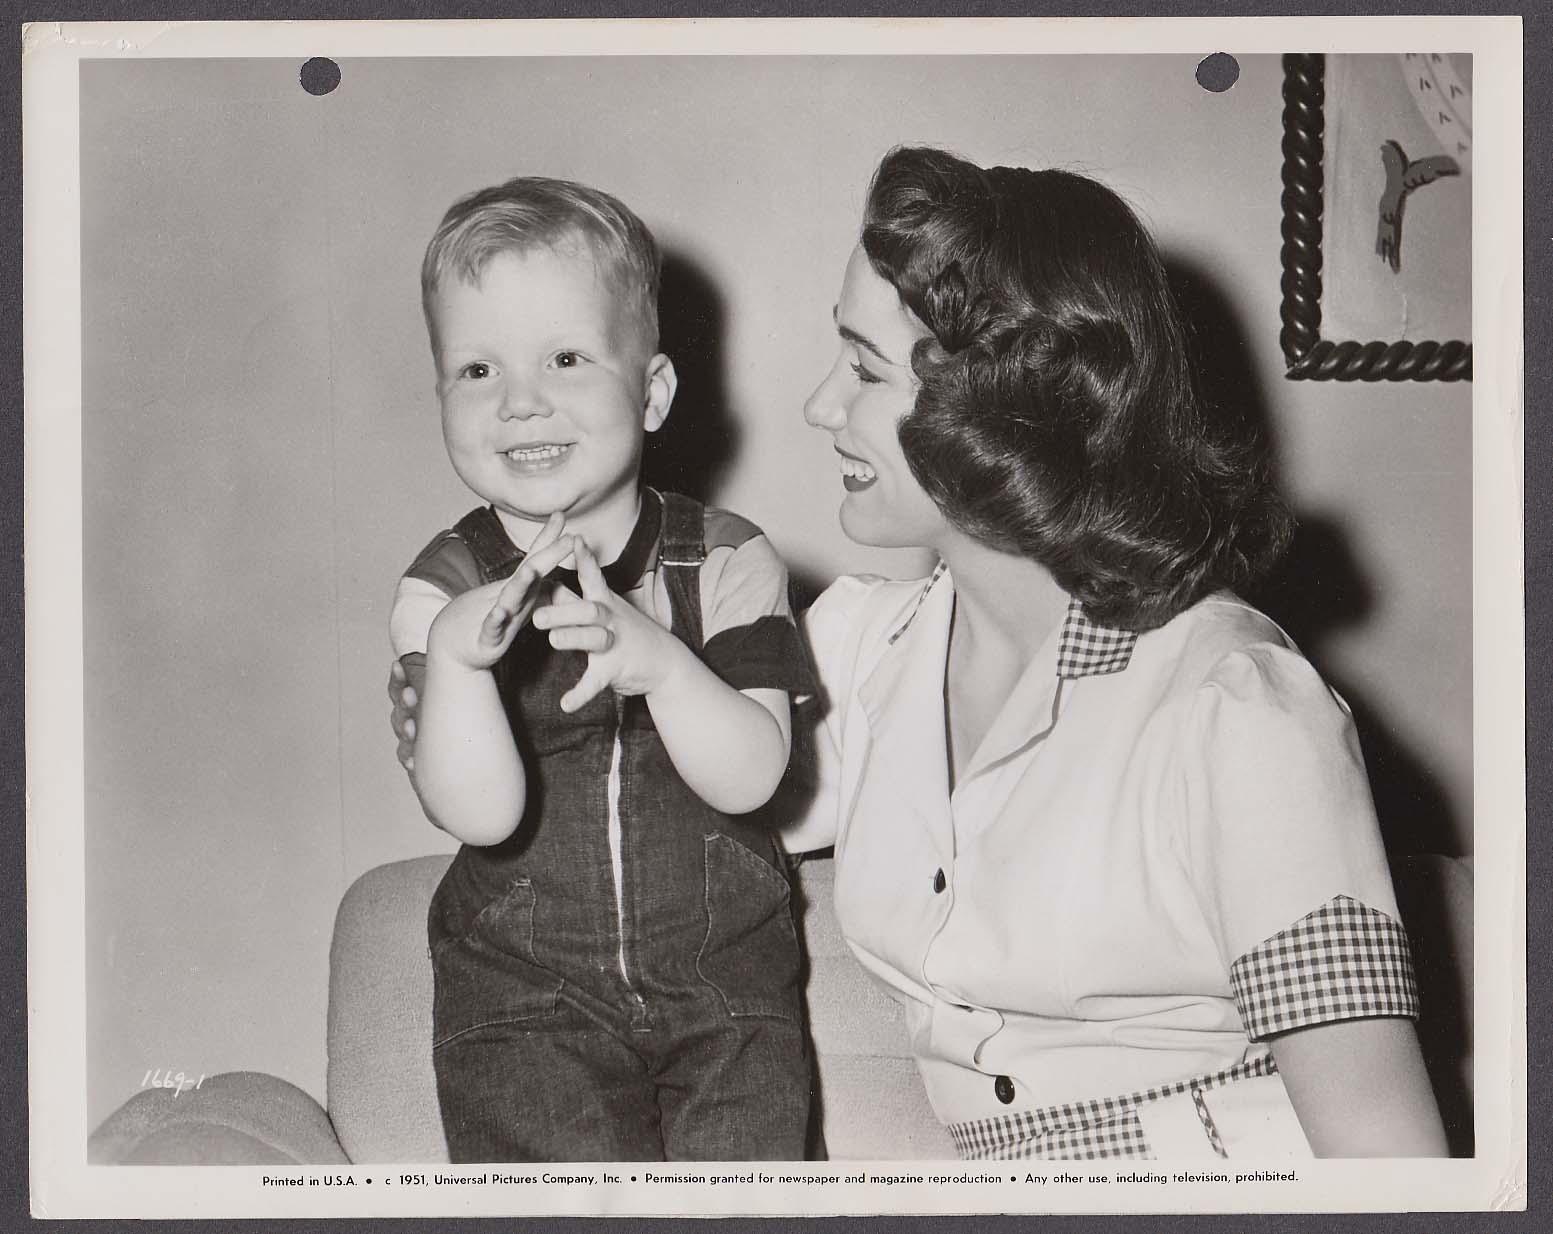 Dusty Henley Julie Adams Finders Keepers 8x10 photo 1951 #1